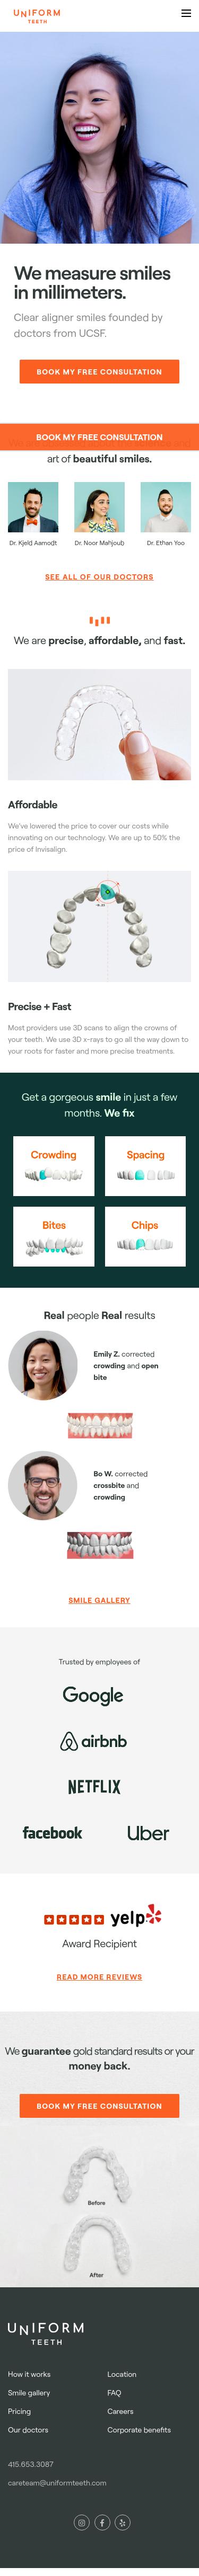 Example of Design for Health, Oral & Dental Care, Mobile Landing Page by uniformteeth.com | Mobile Landing Page Design